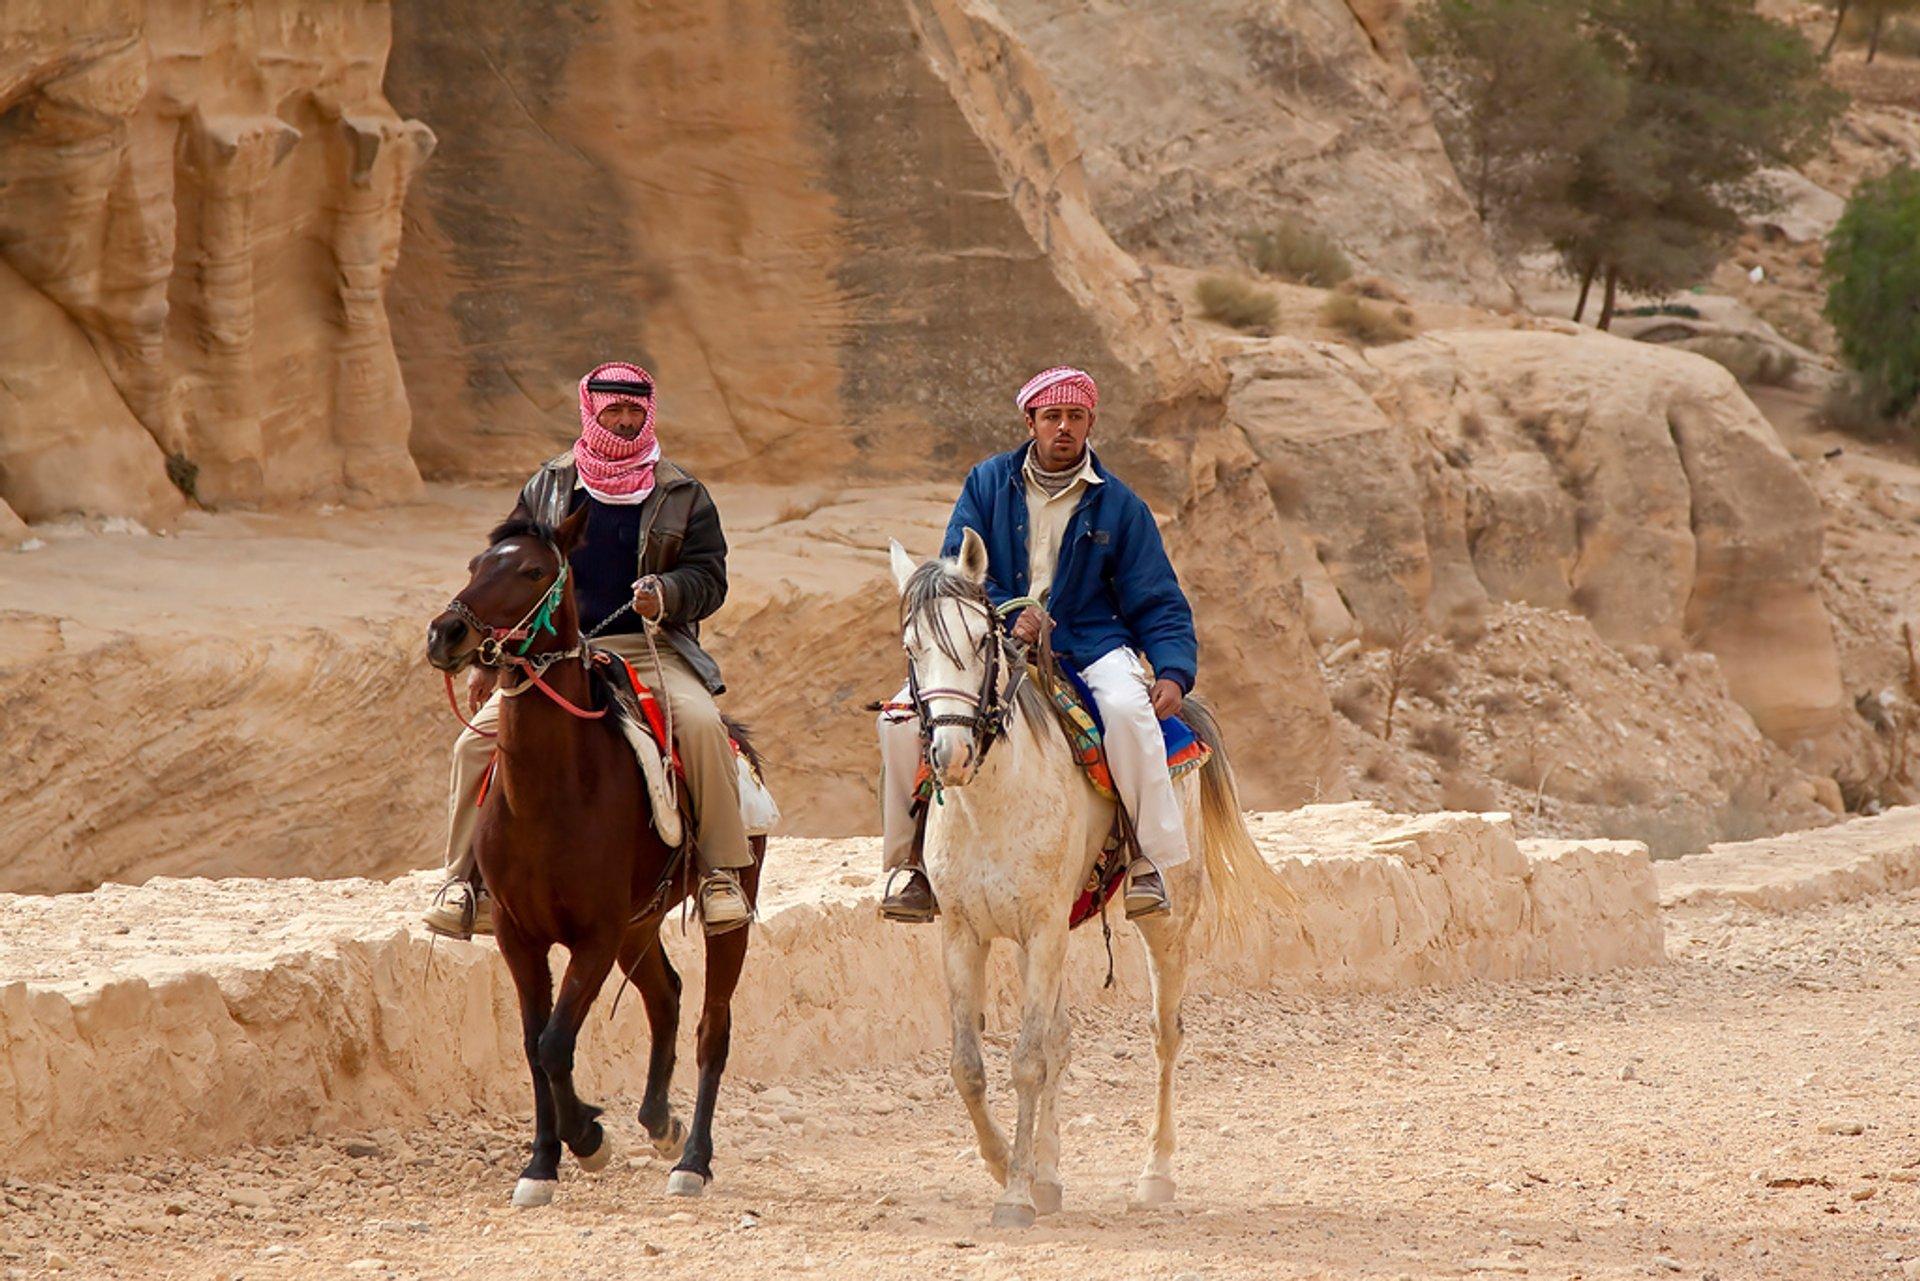 Horseback Riding in Jordan 2020 - Best Time